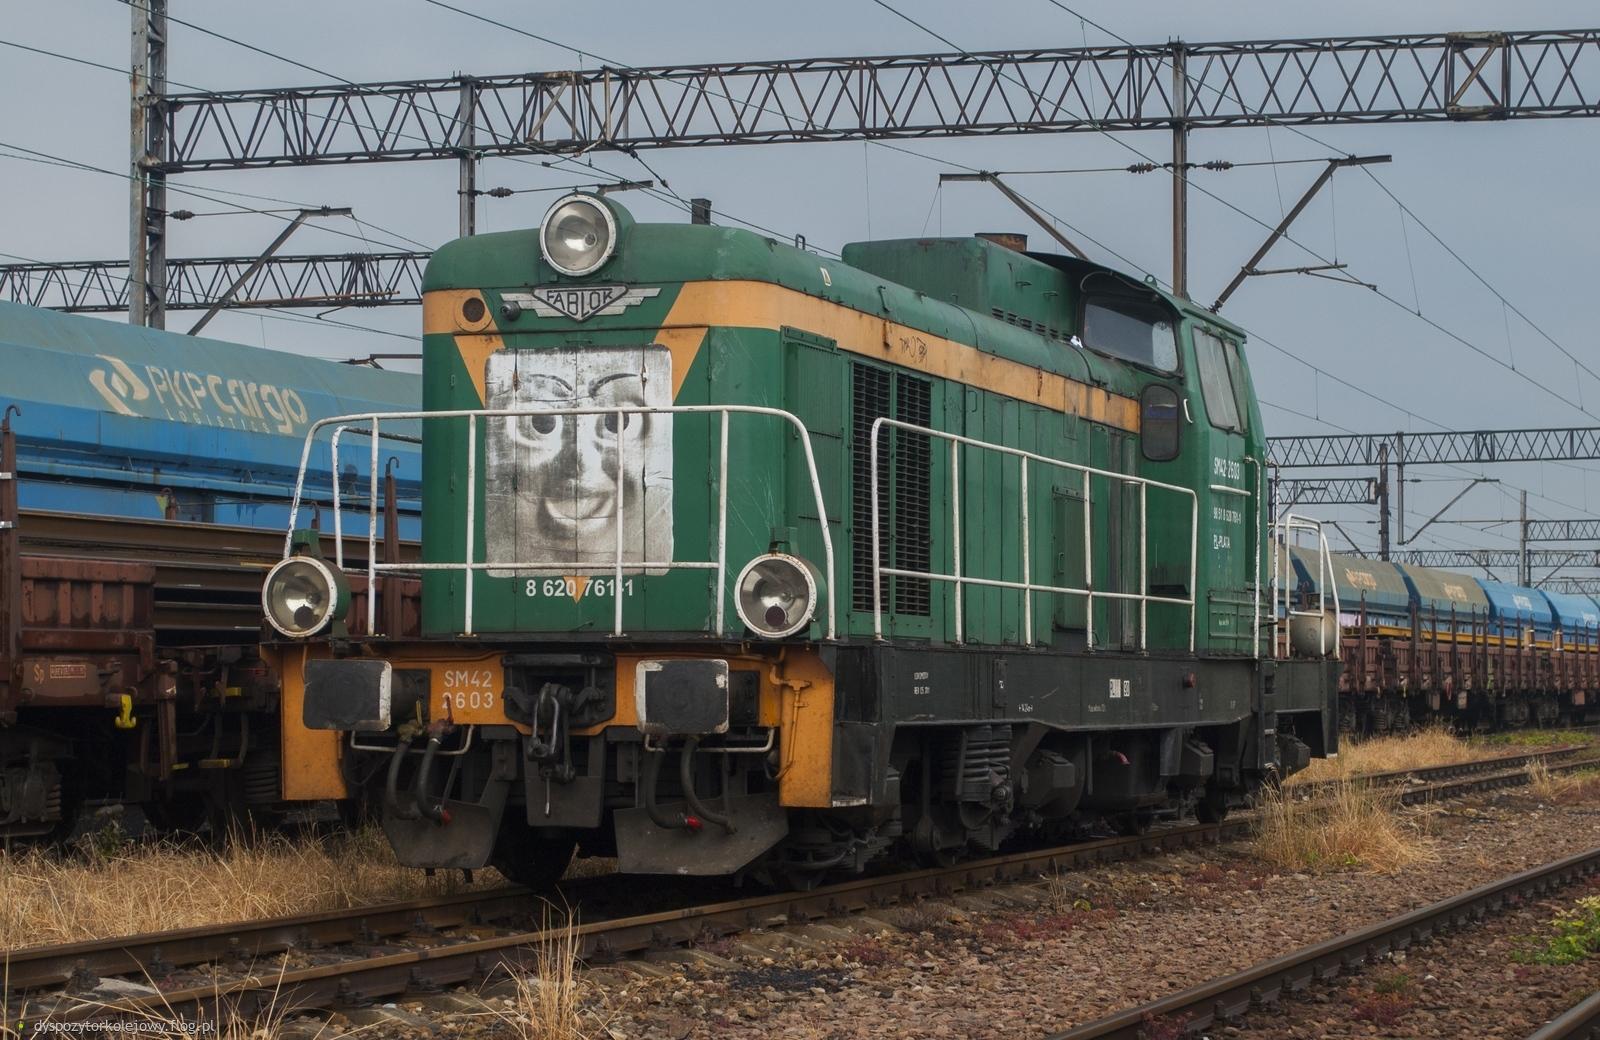 SM42-2603